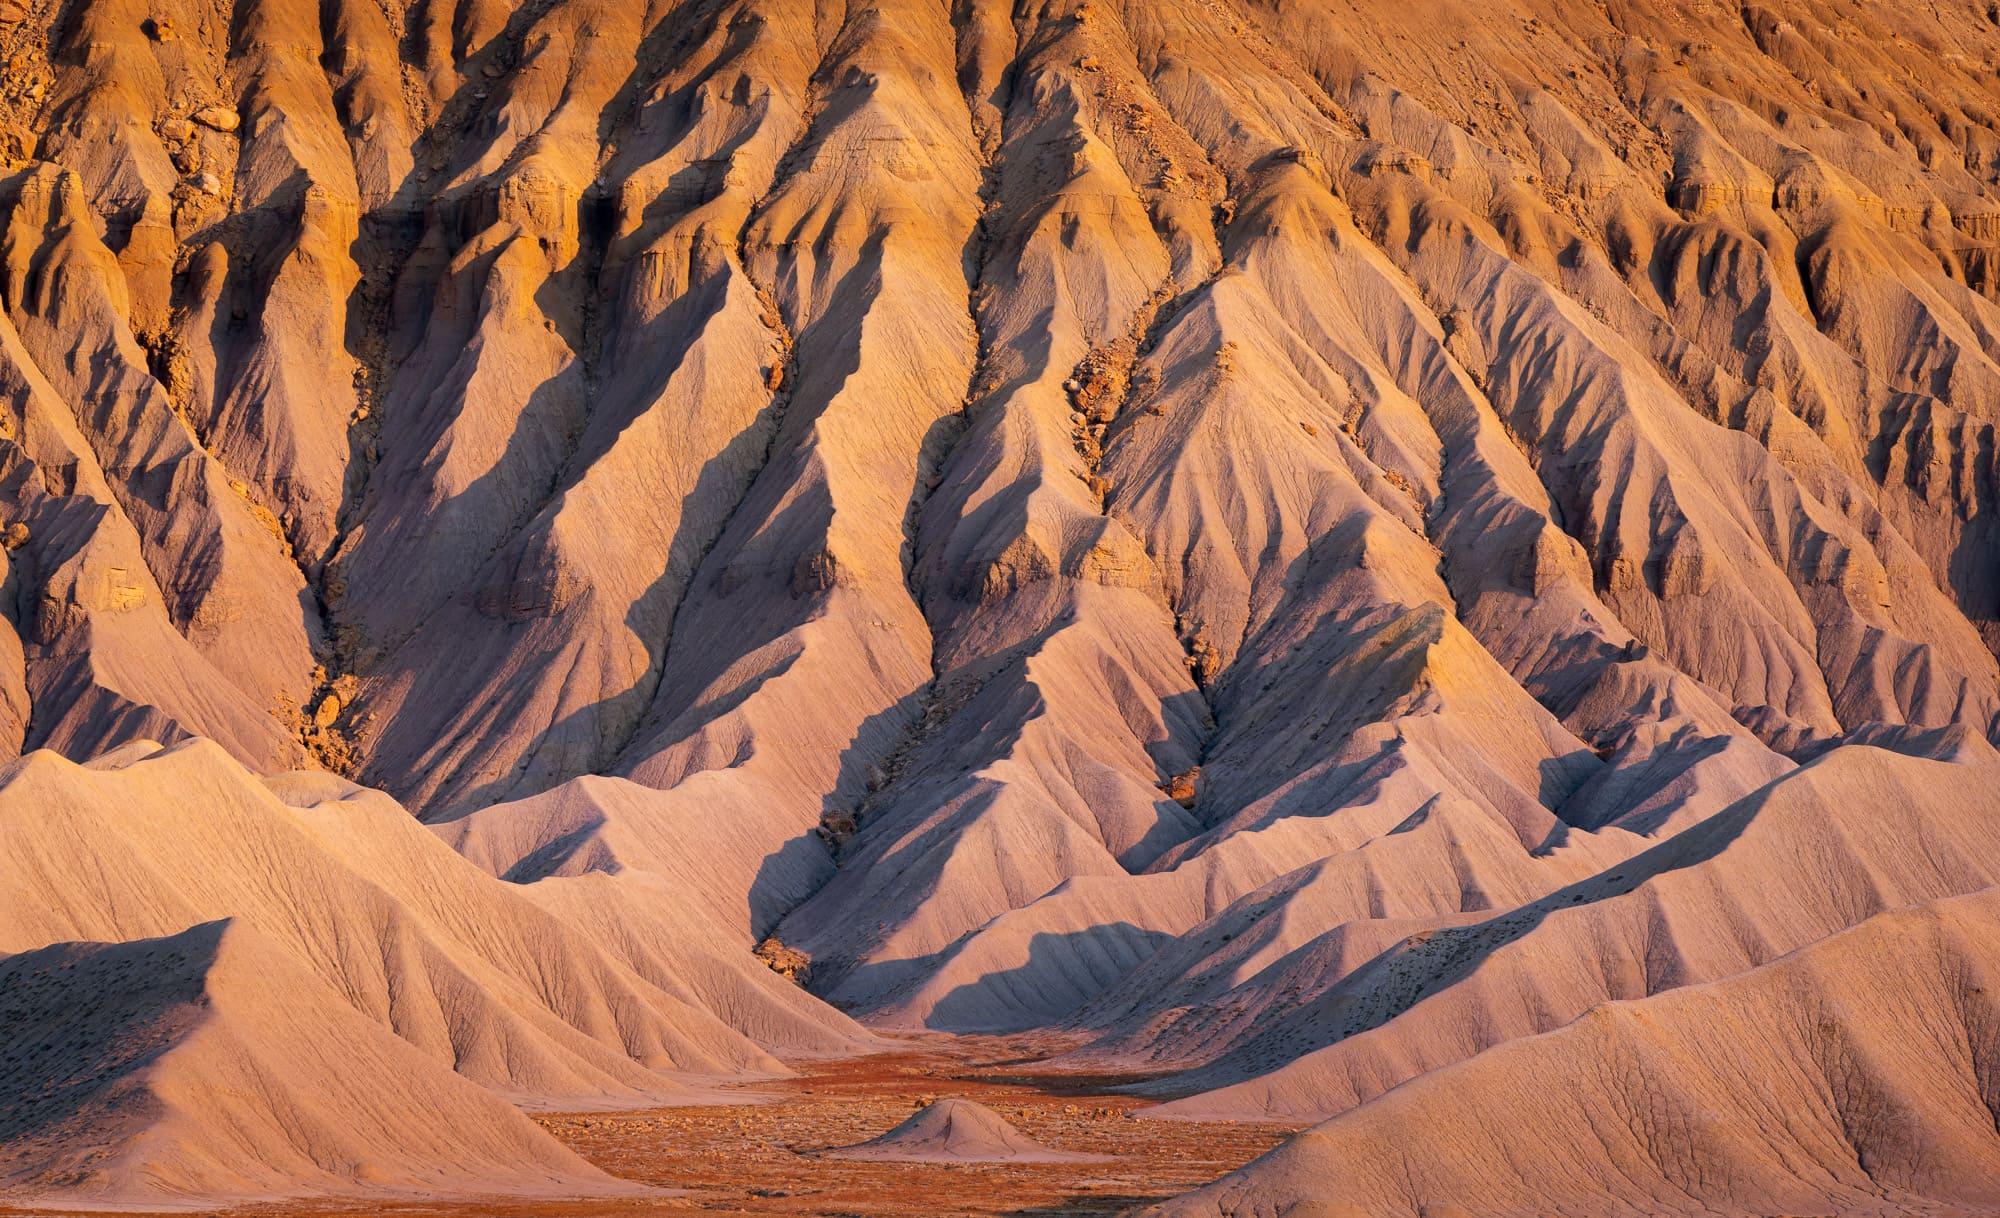 Detail of badlands of Caineville Mesa, Utah